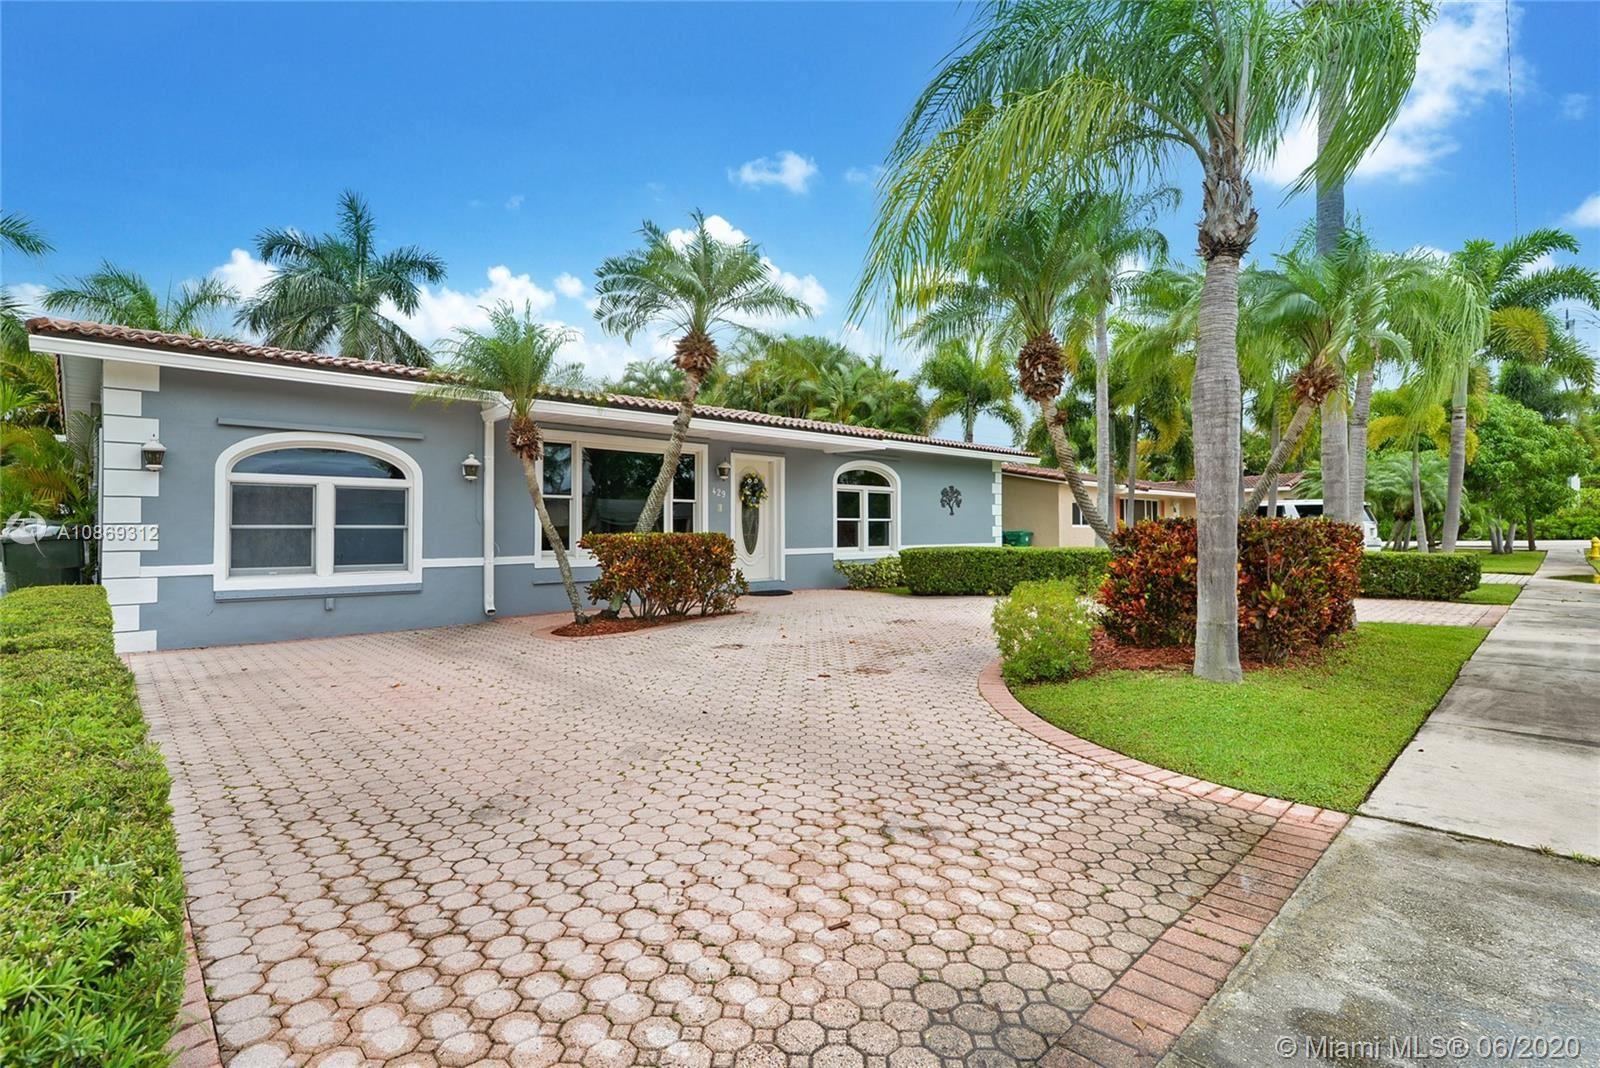 Photo of 429 SE 3rd Ter, Dania Beach, FL 33004 (MLS # A10869312)